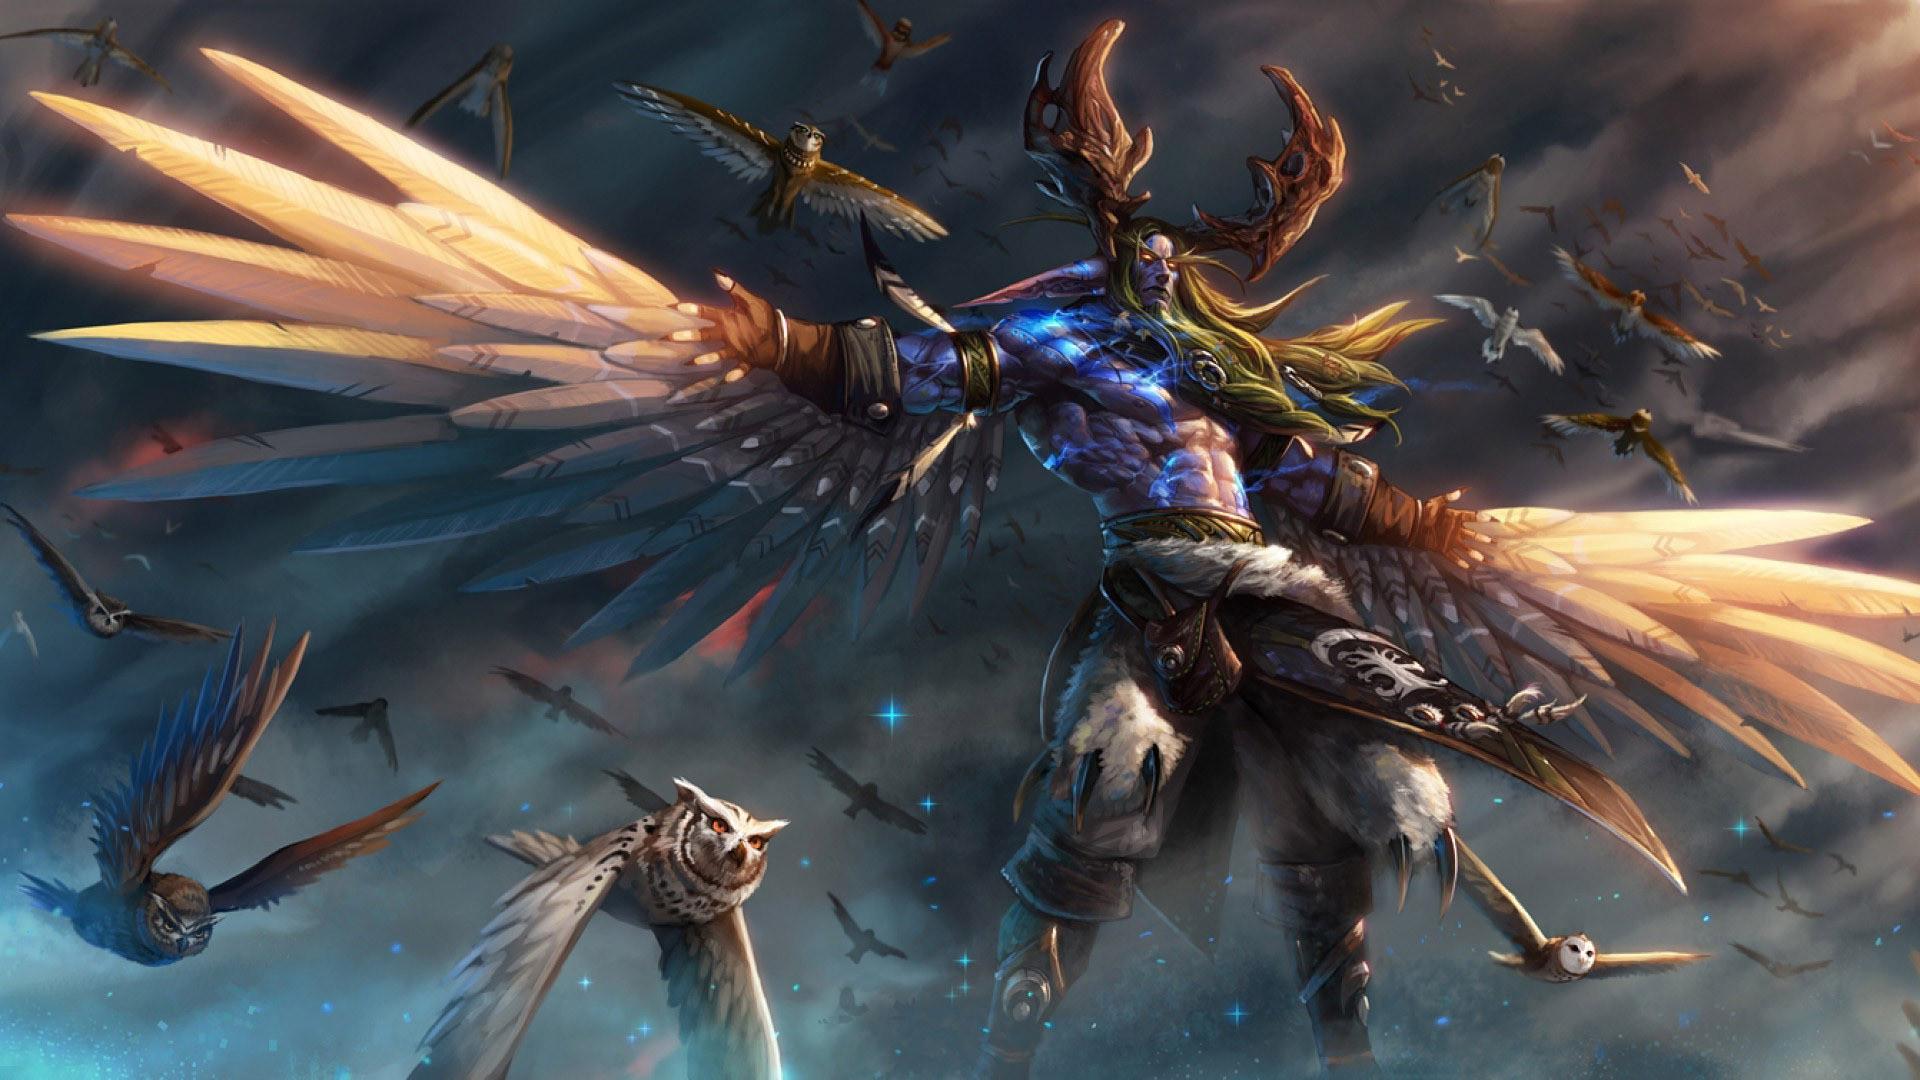 malfurion-stormrage-world-of-warcraft-game-hd-wallpaper-1920×1080-6739.jpg  (1920×1080)   Blizzard   Pinterest   Character ideas